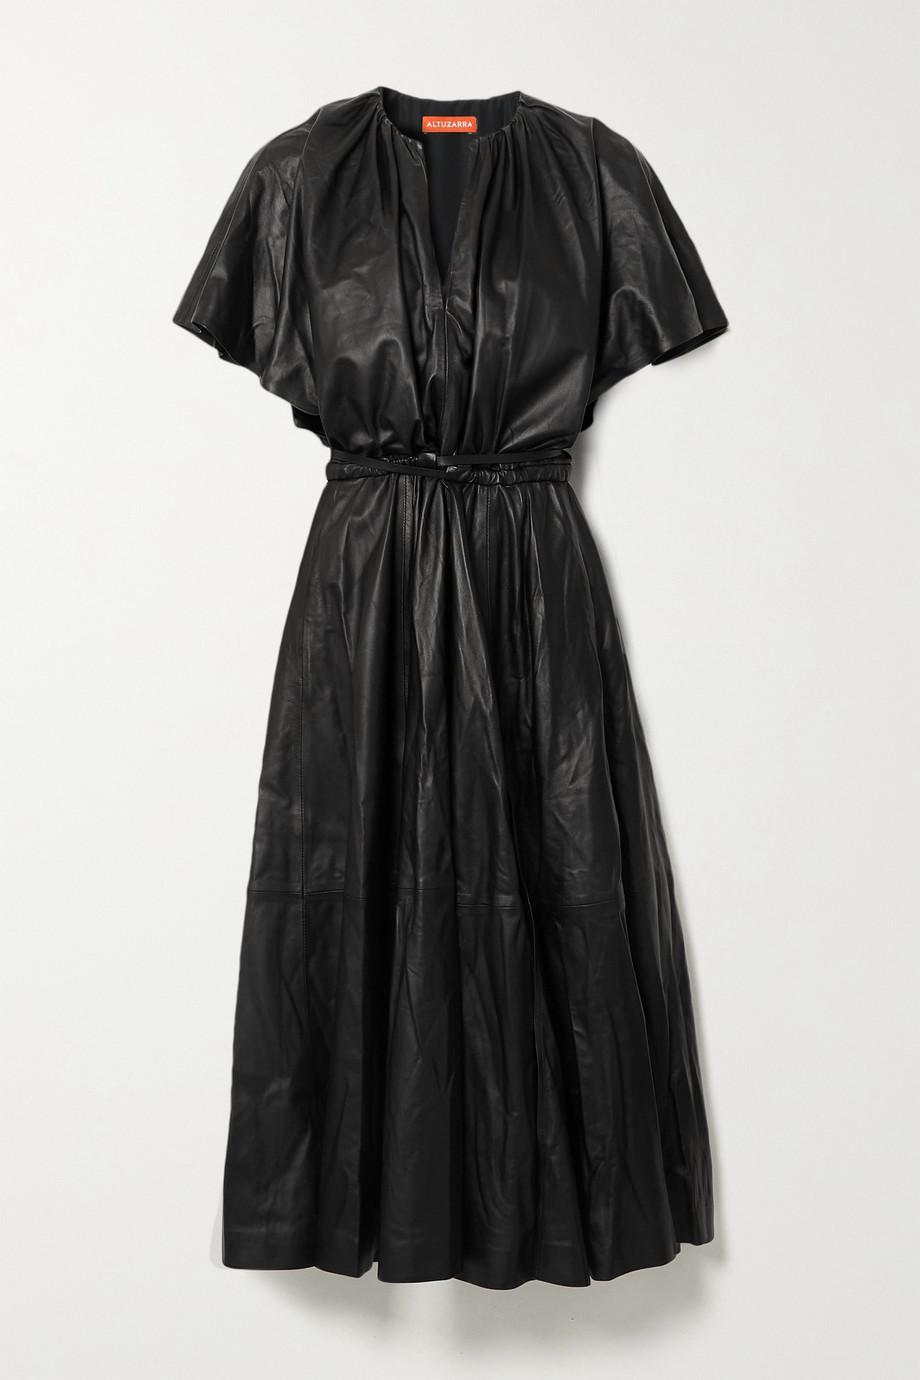 Altuzarra Romy belted gathered leather midi dress